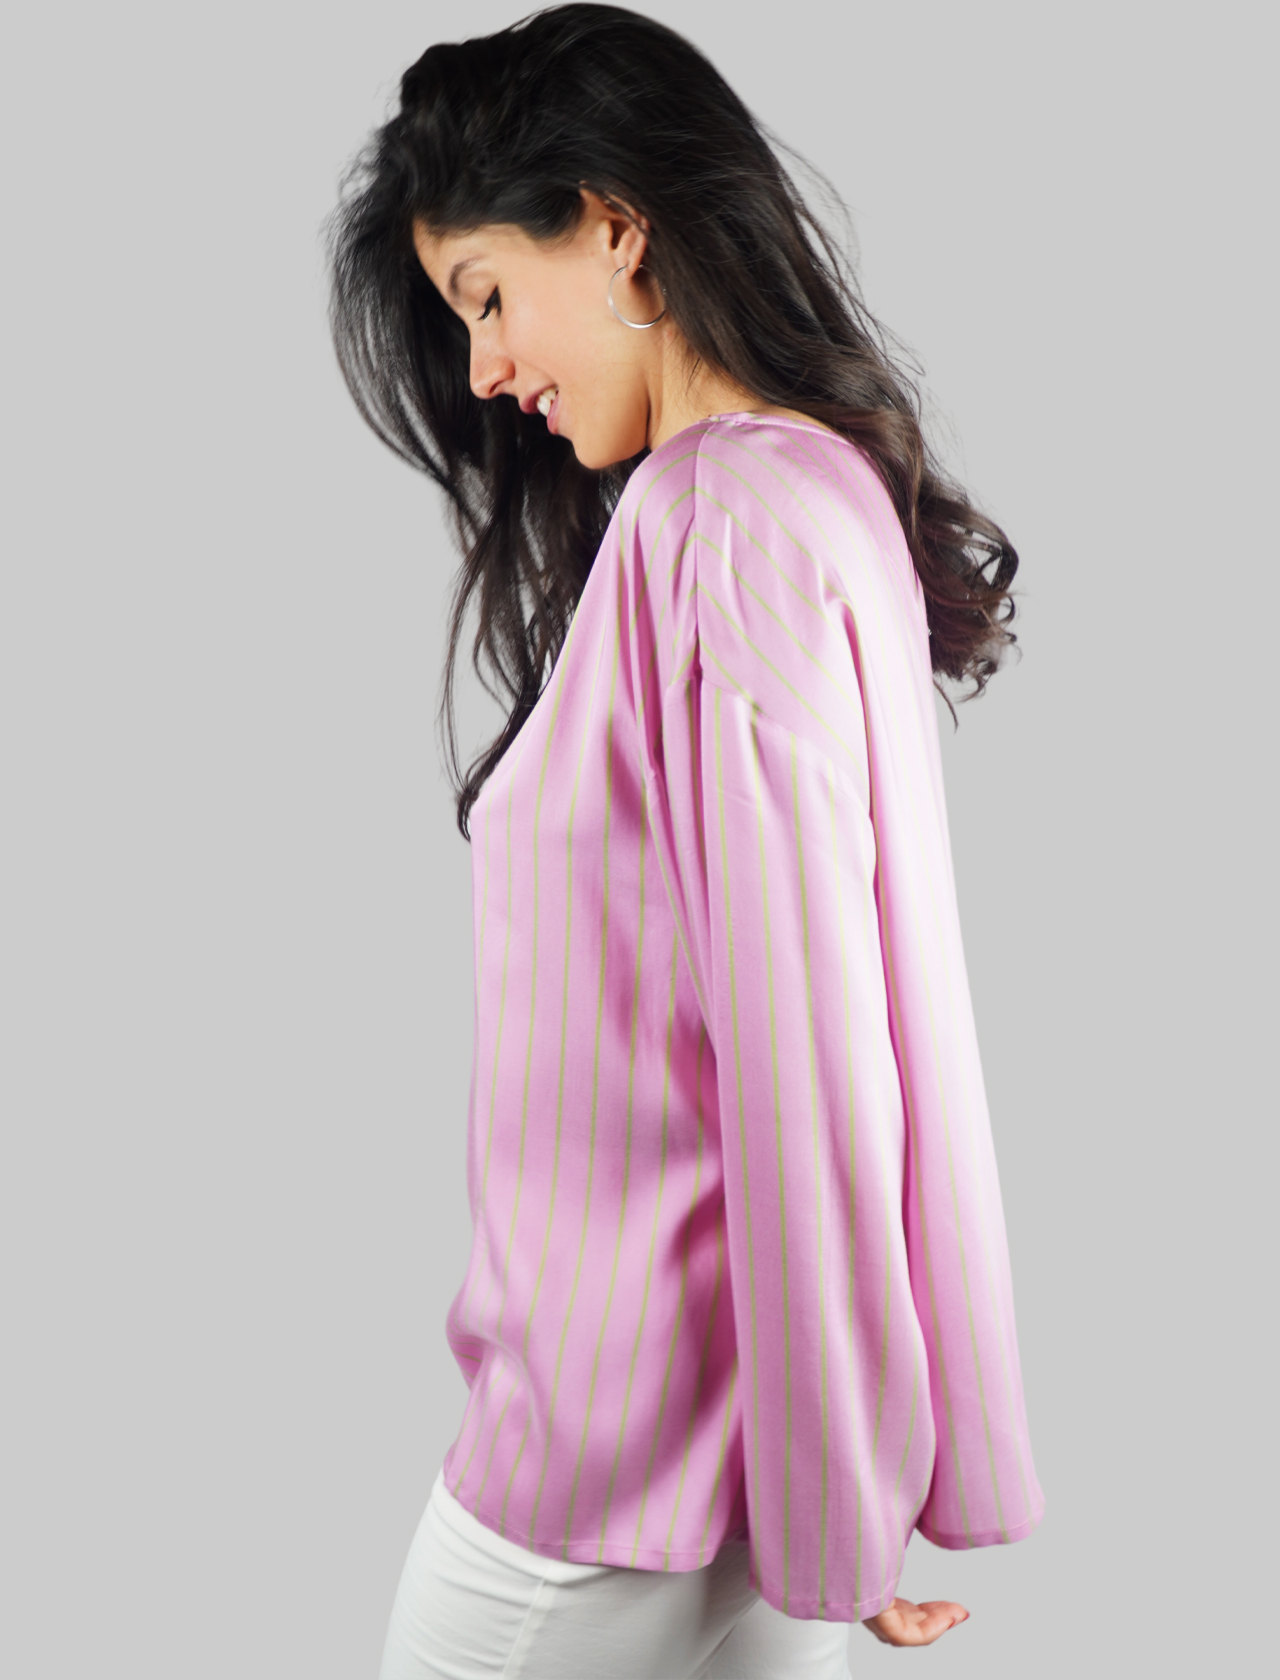 Abbigliamento Donna Camicia T-shirt Manica Lunga in Pura Seta Stripes on Silk Rosa e Verde Maliparmi | T-shirt e Canotte | JM45275055632B60